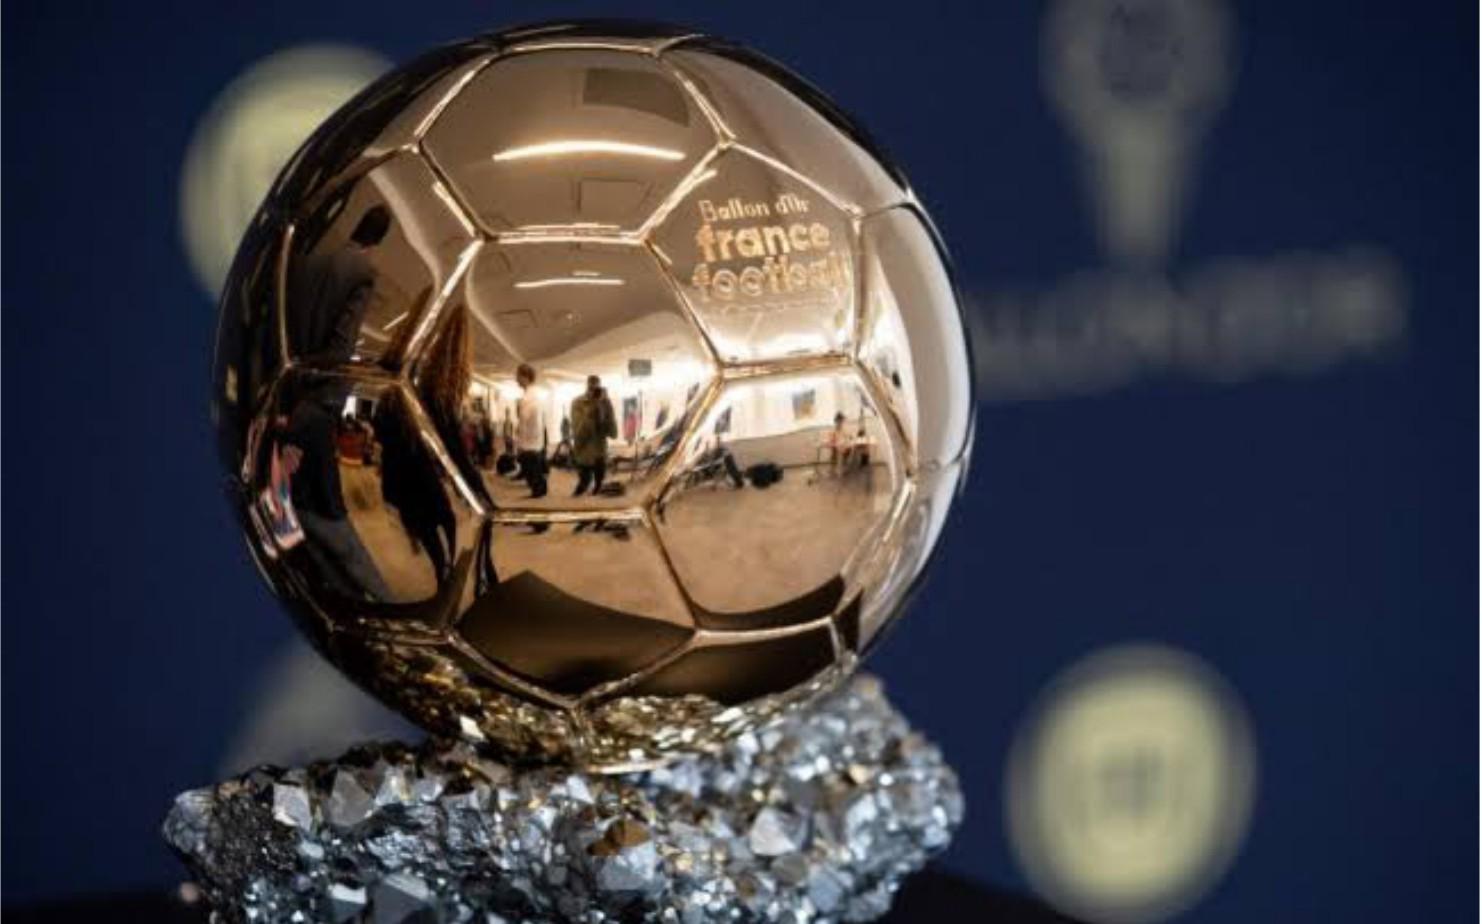 Ballon d'Or 2020 scrapped due to coronavirus disruption